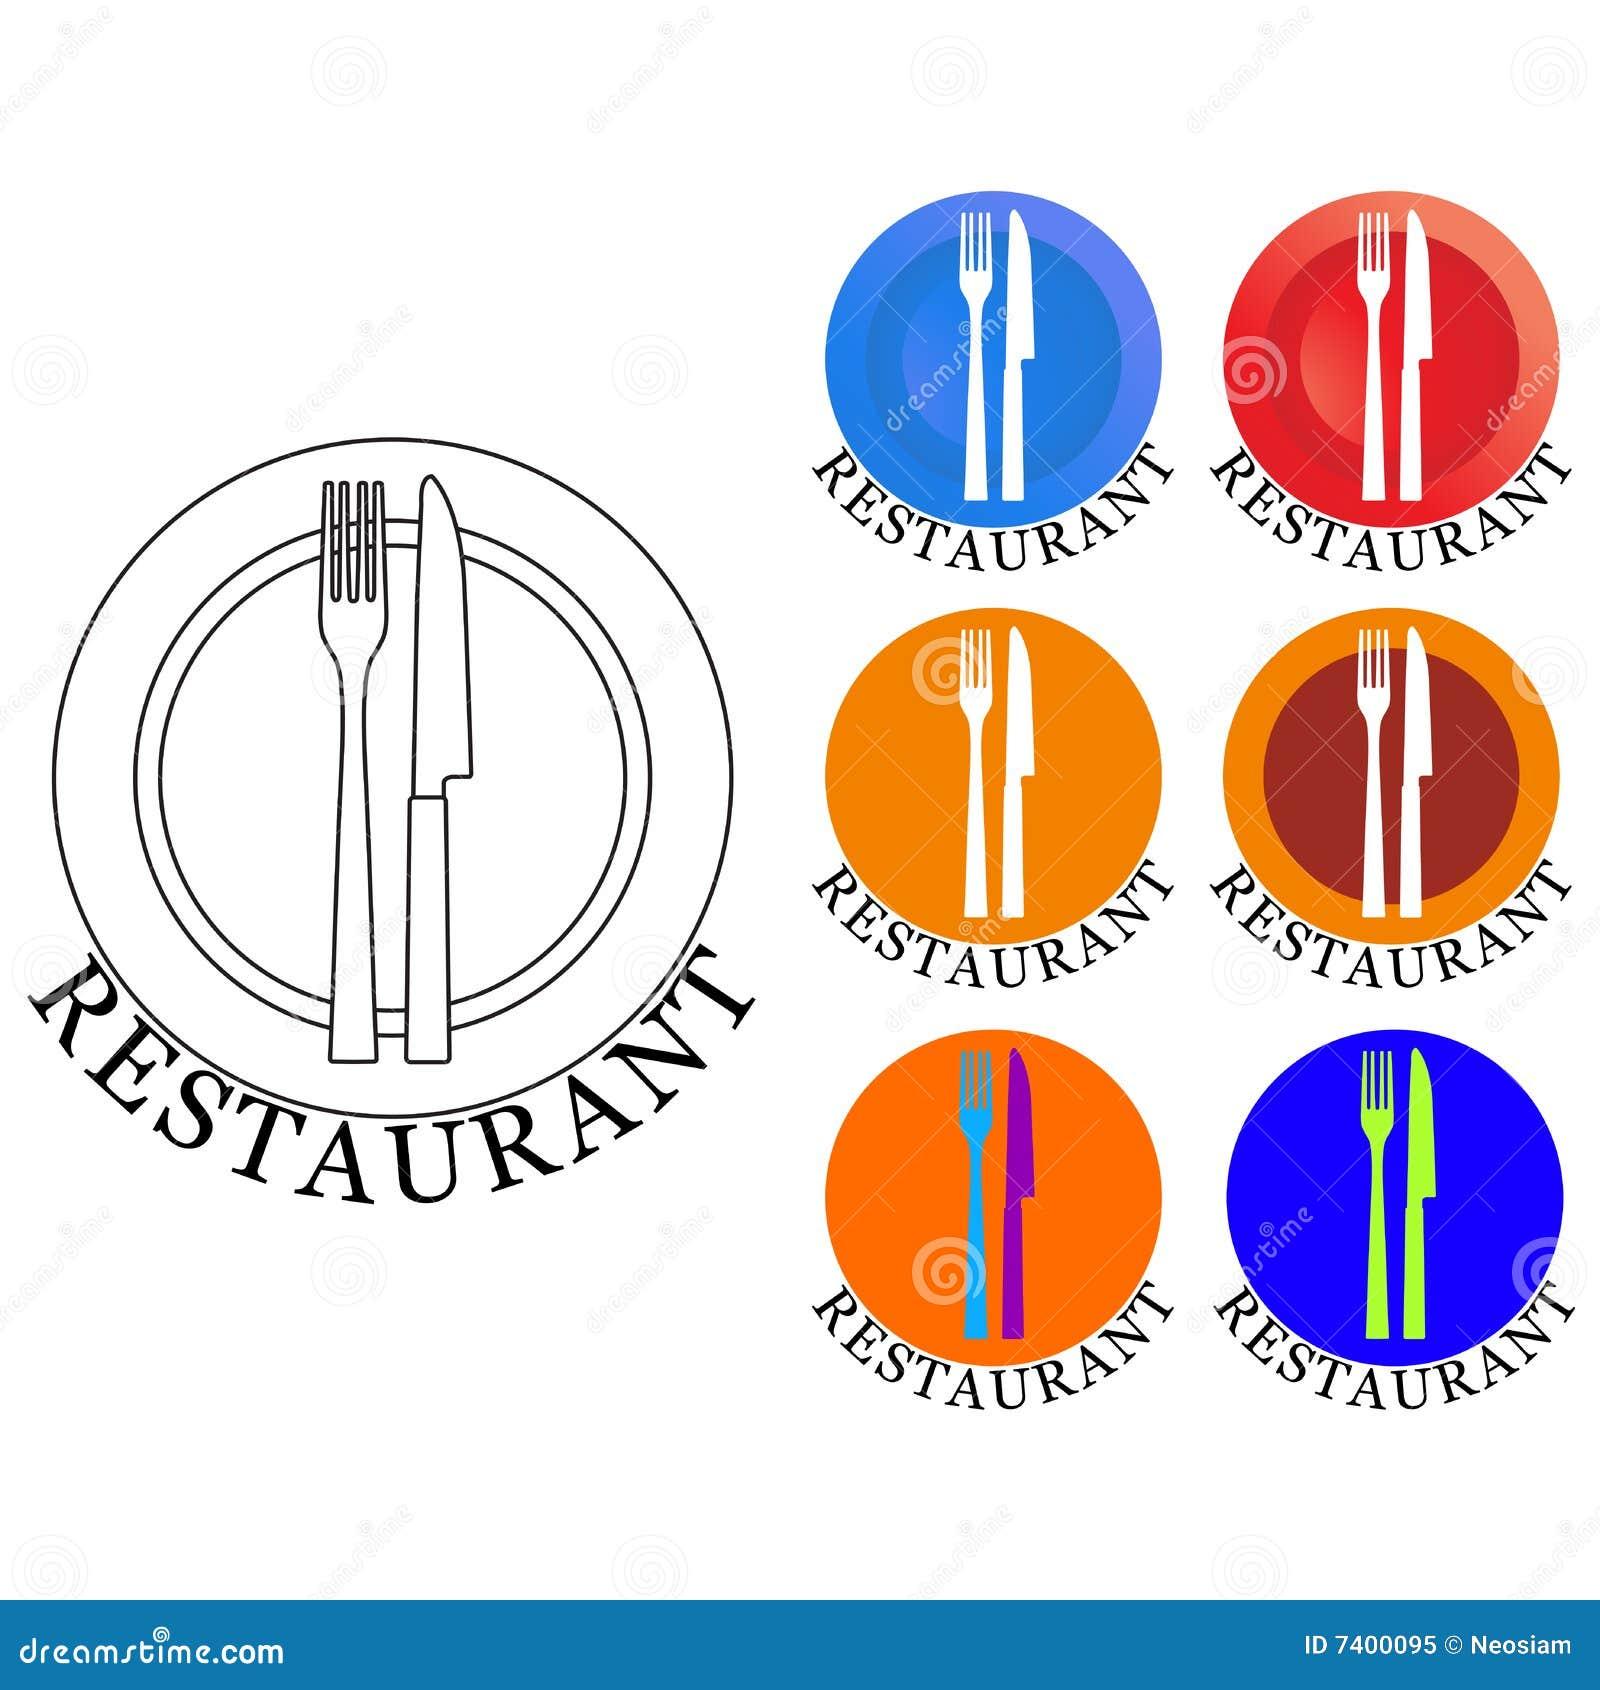 Logo De Restaurant Photo libre de droits - Image: 7400095